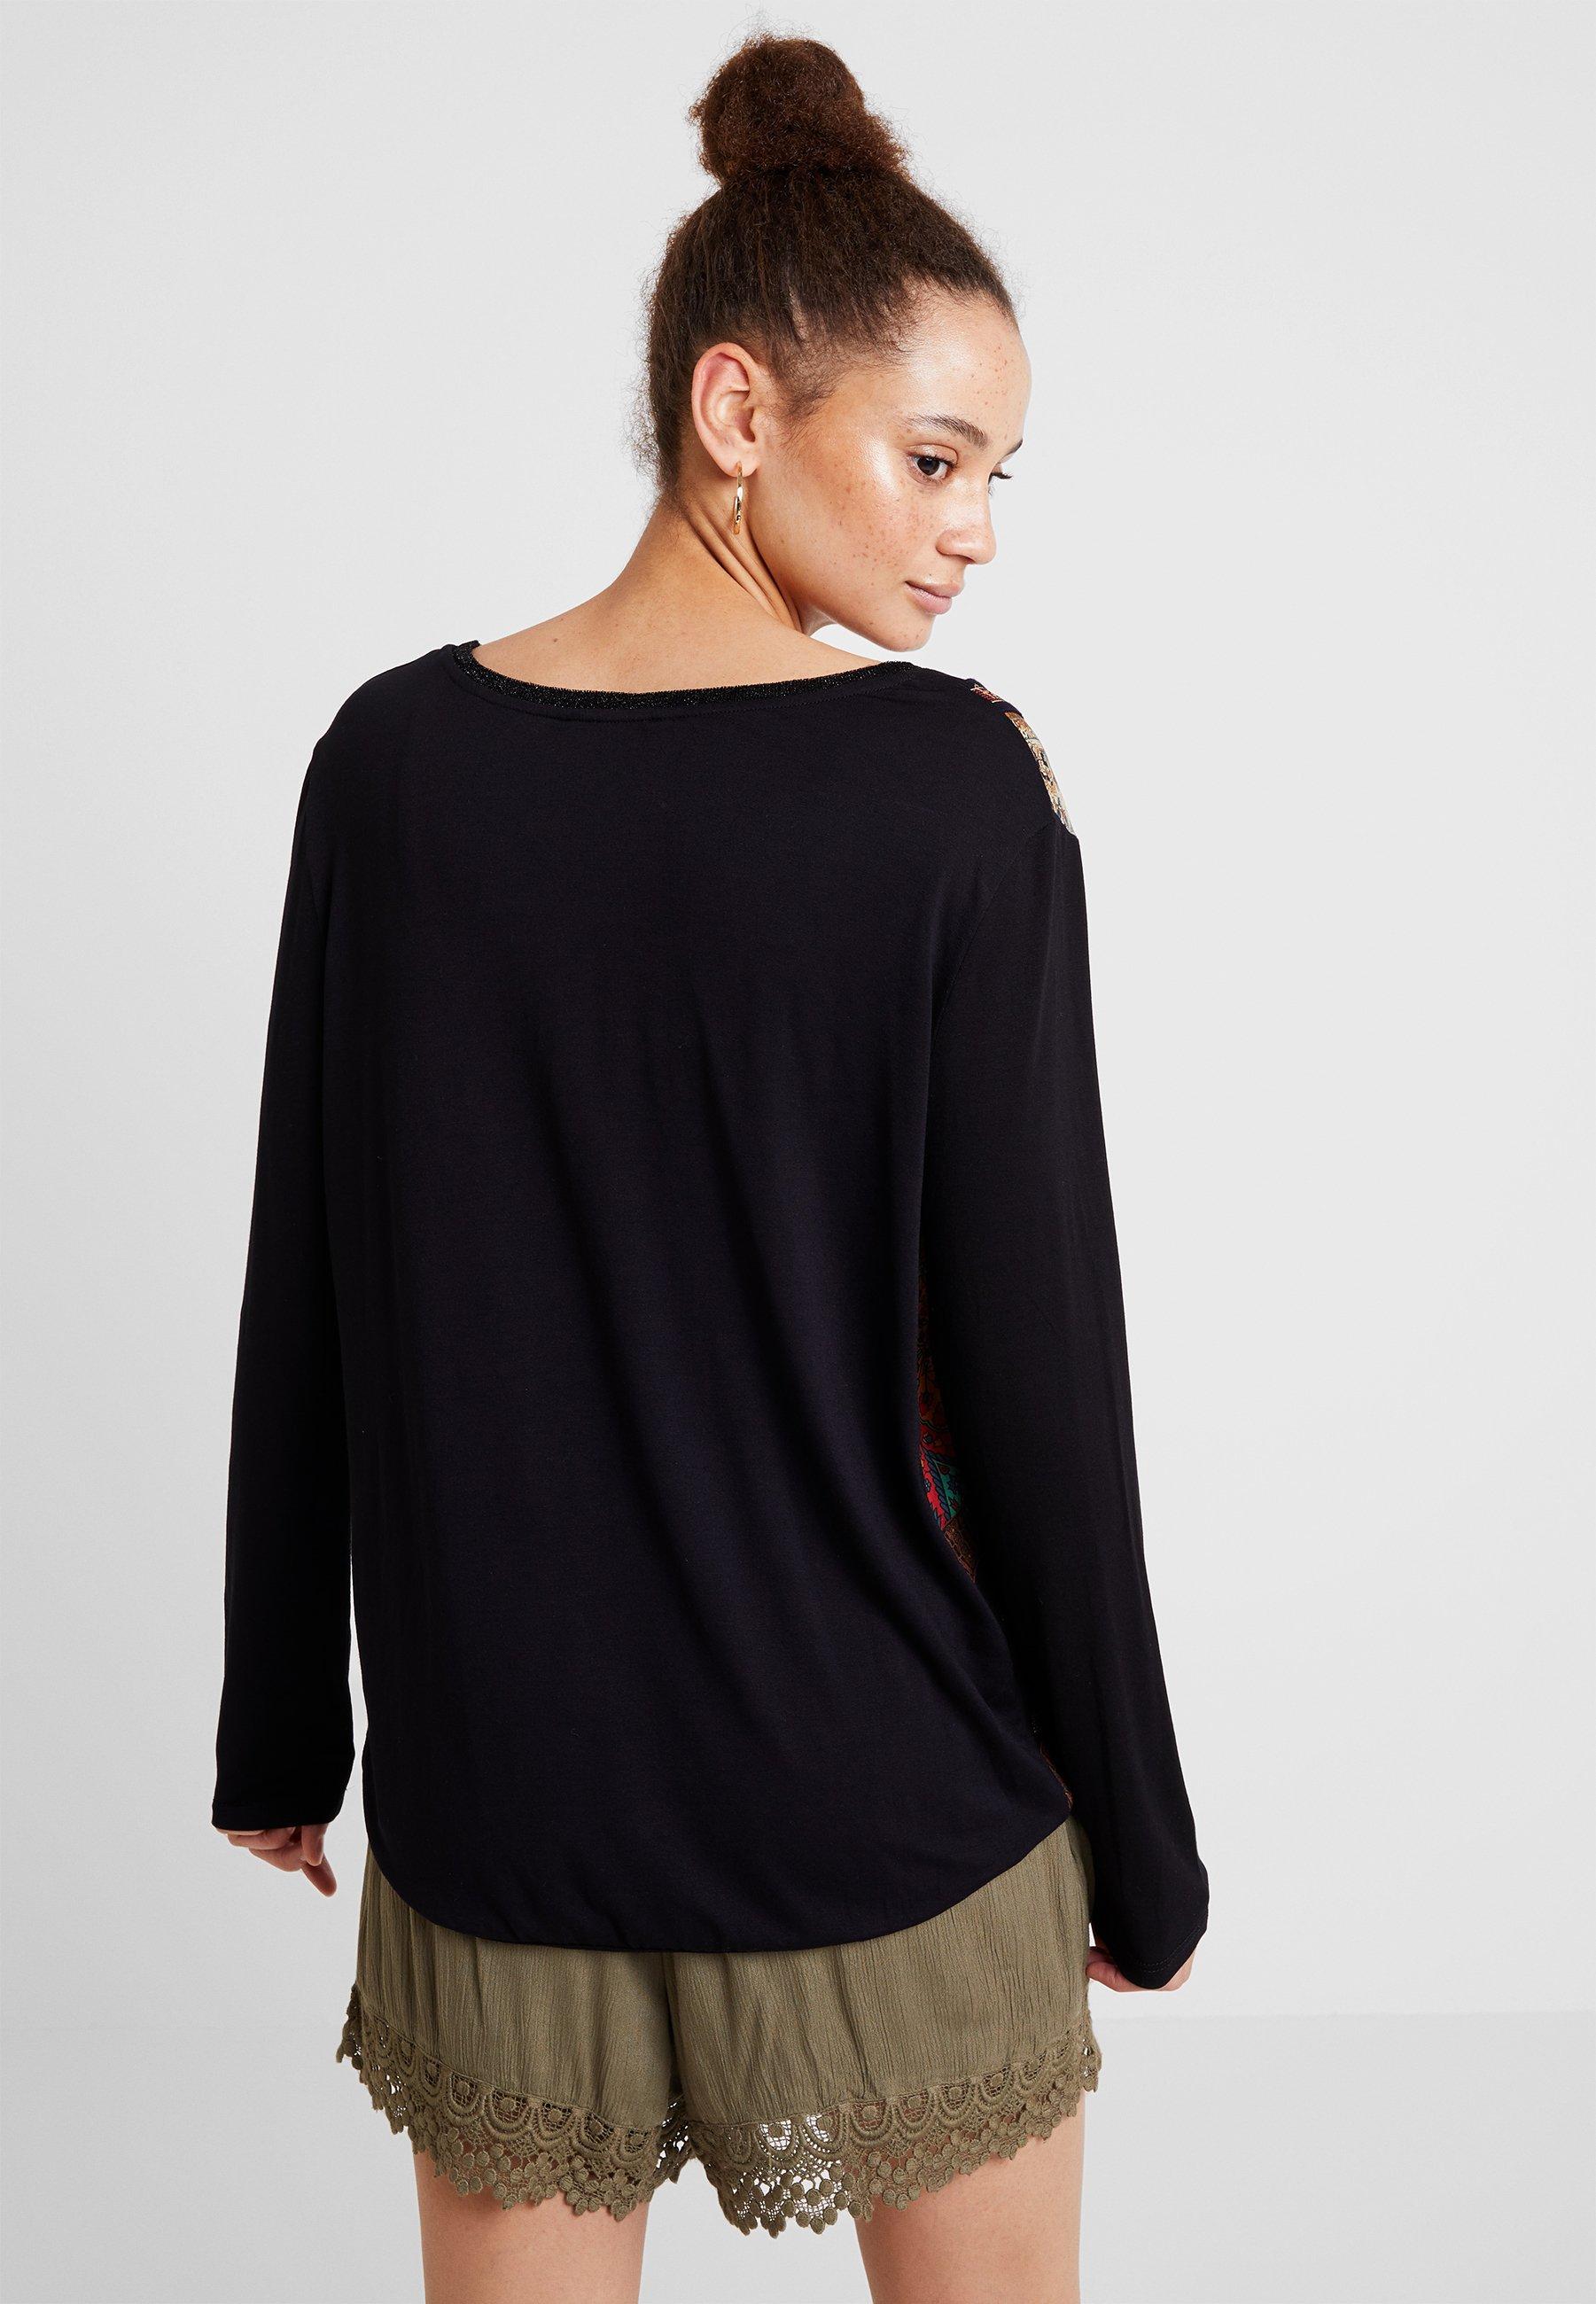 BridgetT À shirt Desigual Manches Black Longues TkPOZuiX